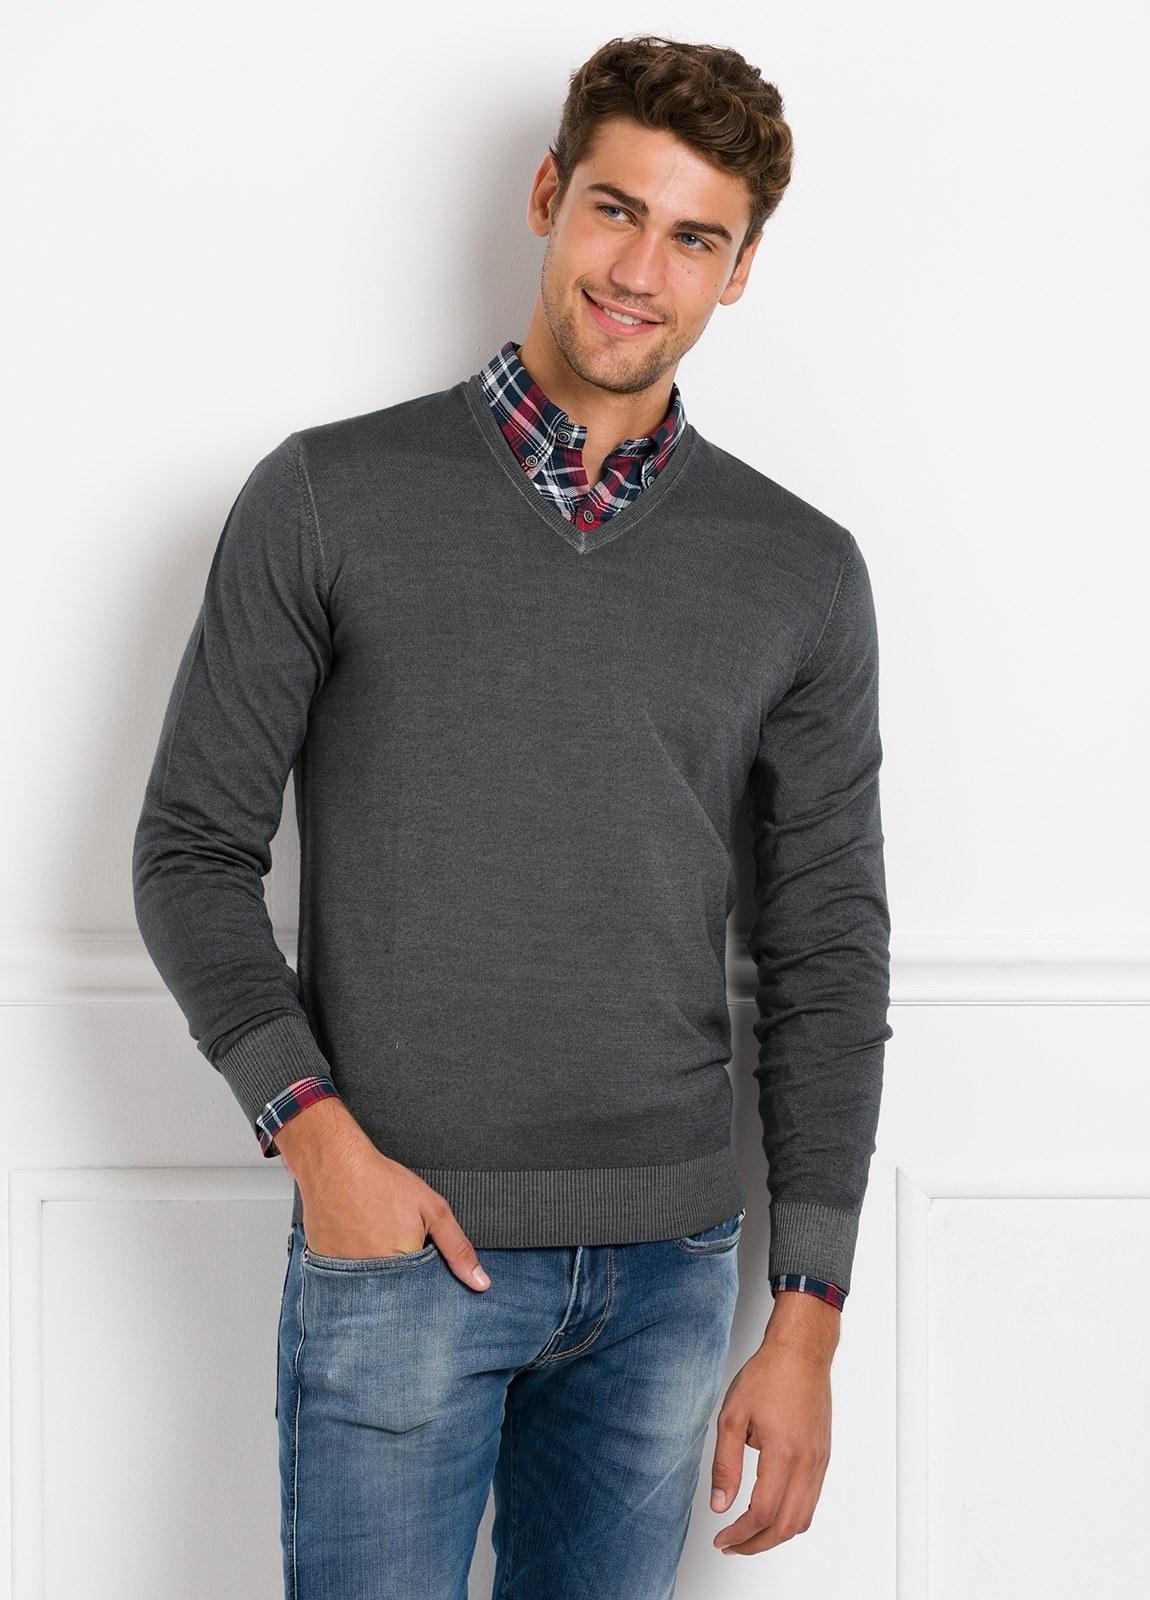 Suéter manga larga, cuello pico, color gris. 100% Lana.